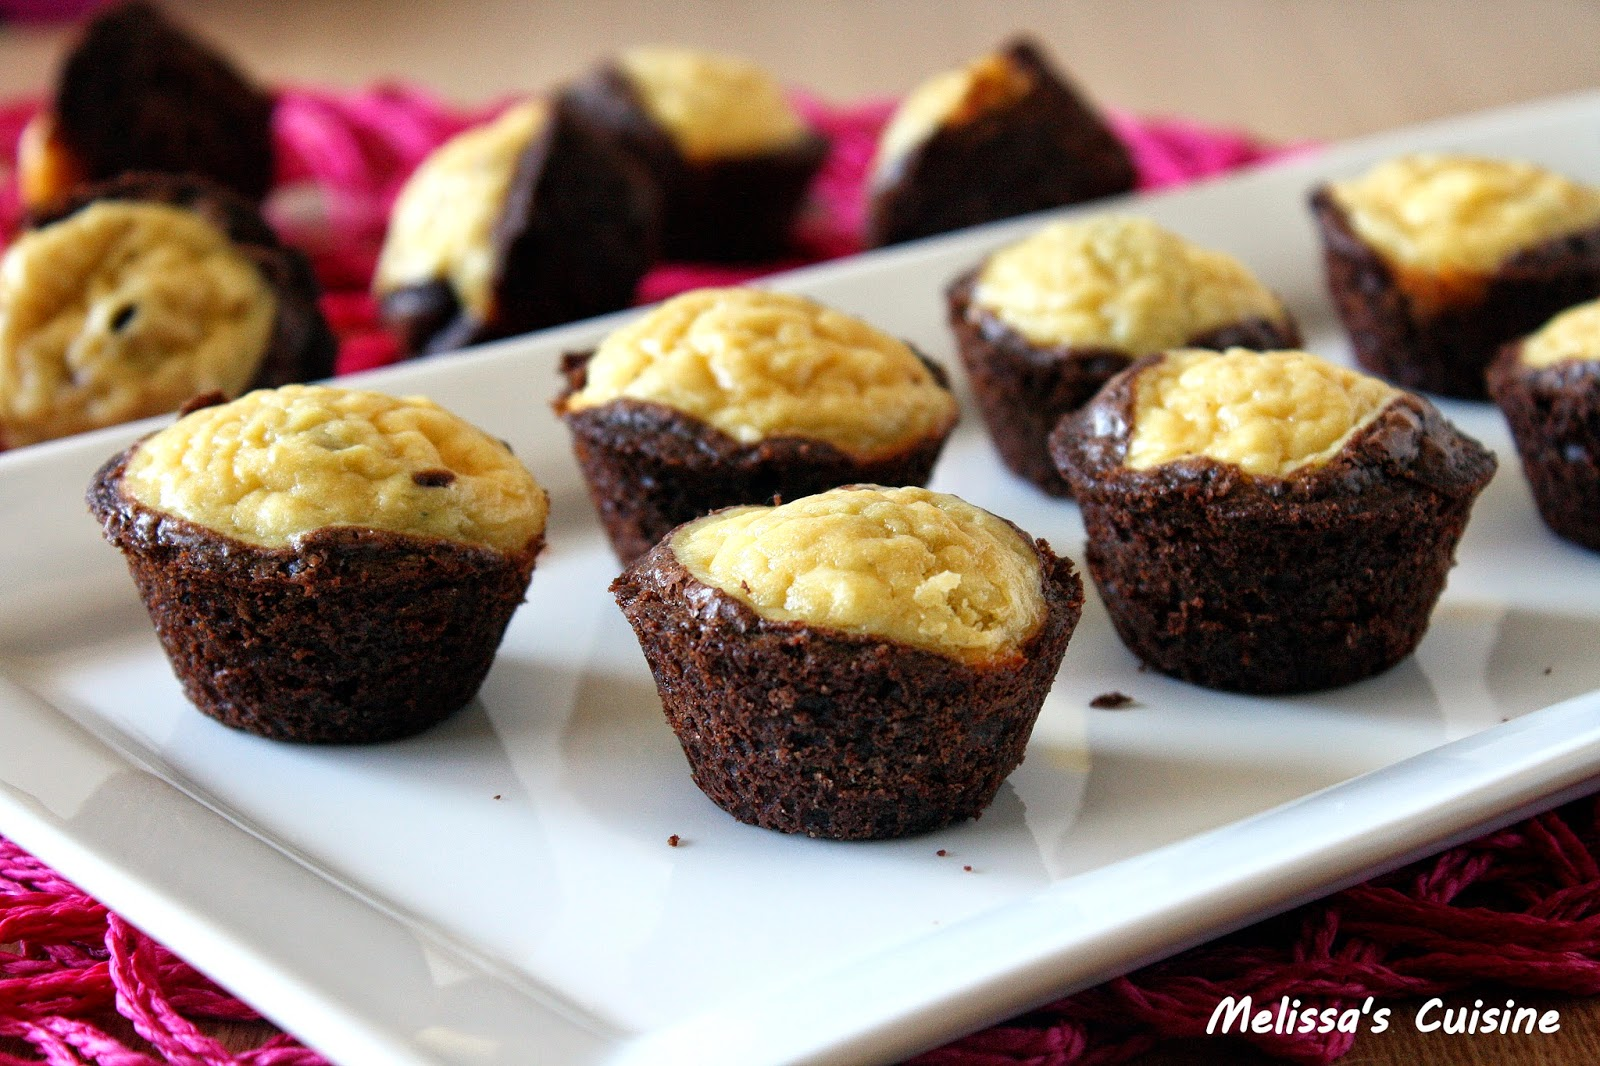 Melissa's Cuisine: Bite-sized Cheesecake Brownies